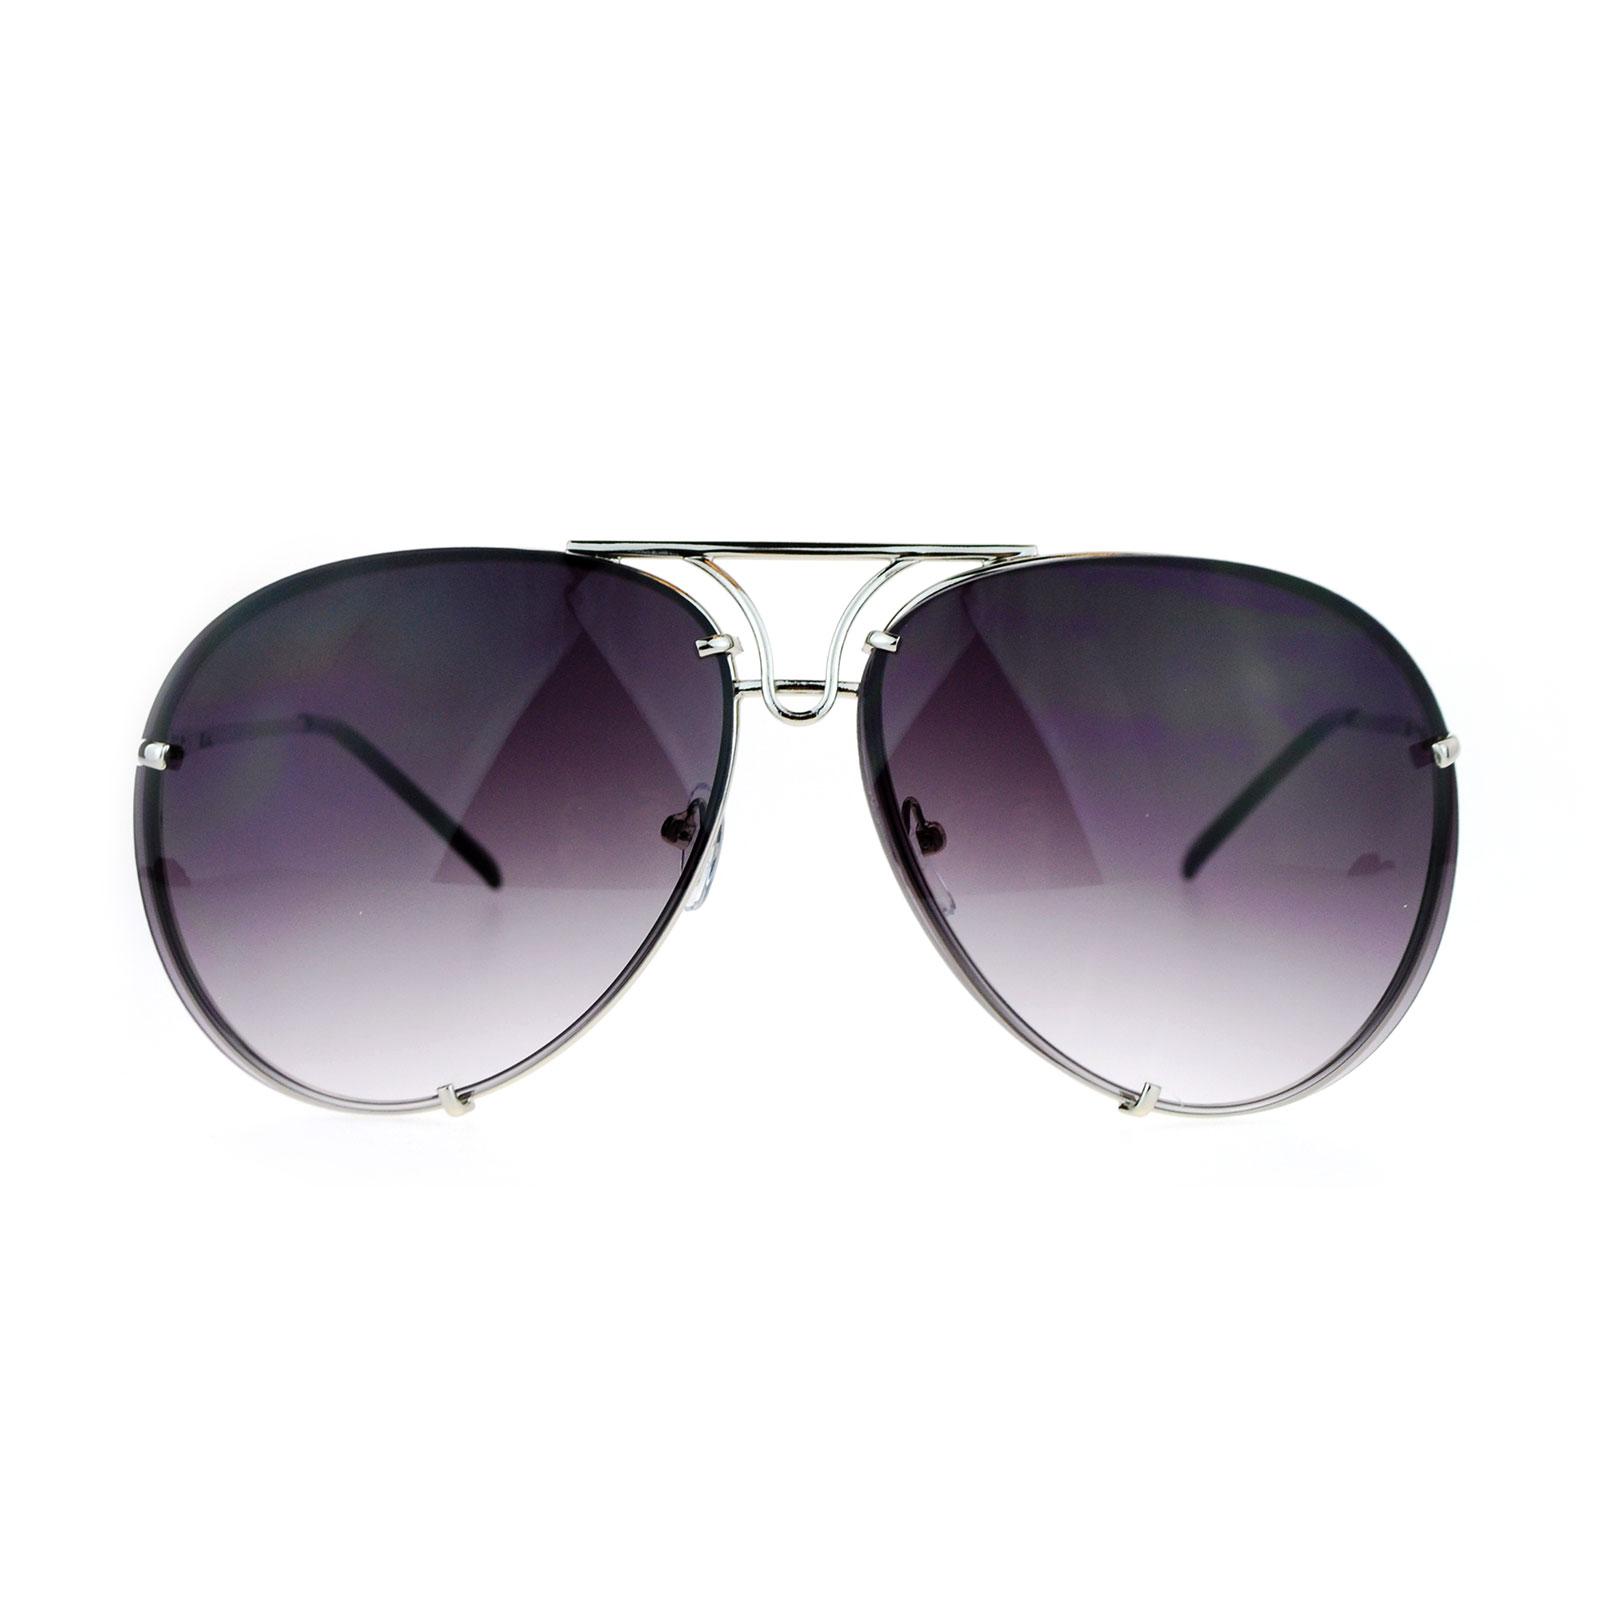 b2a067180db8 Old Style Aviator Sunglasses